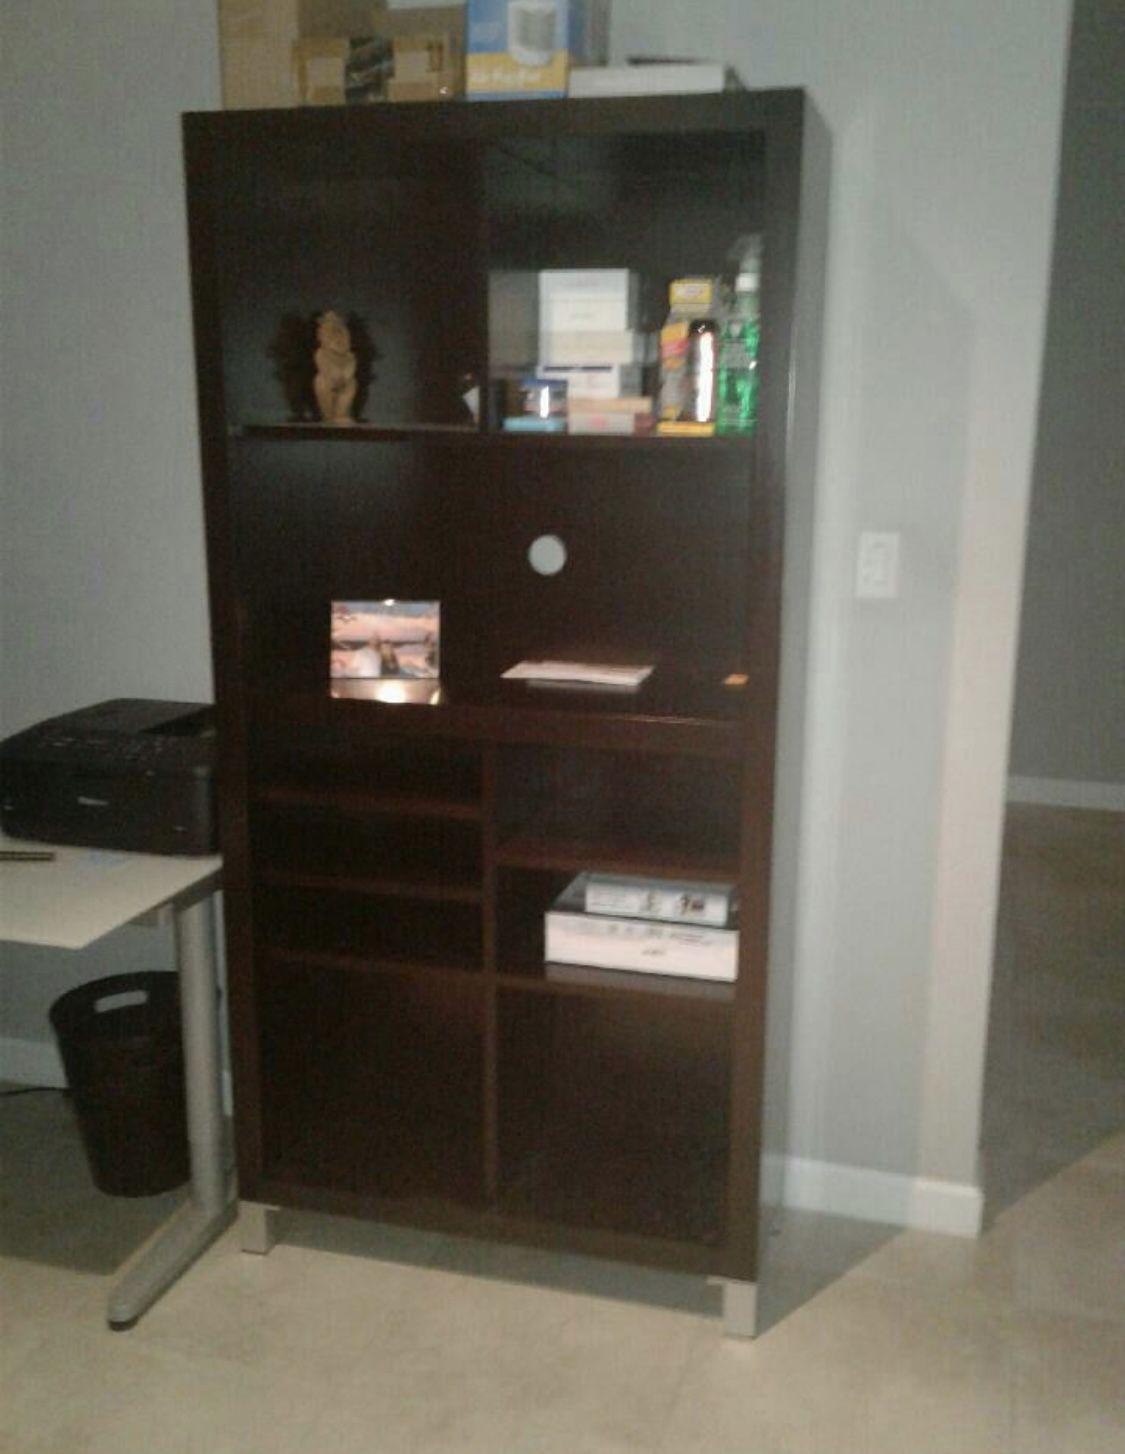 CB2 - Wall Unit - Bookcase - Shelves